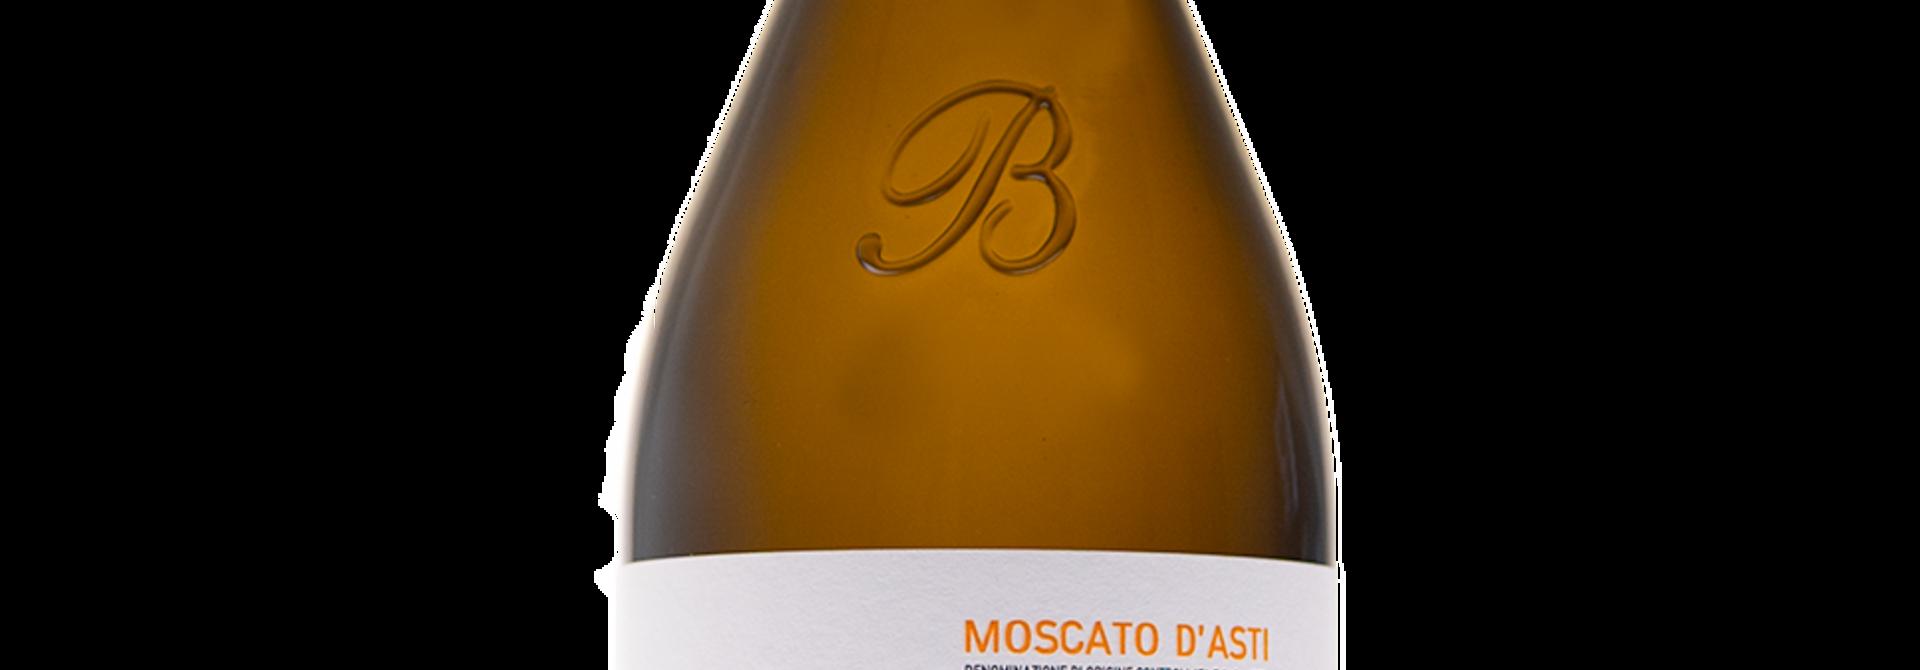 Moscato d'Asti DOCG 2019 Brandini